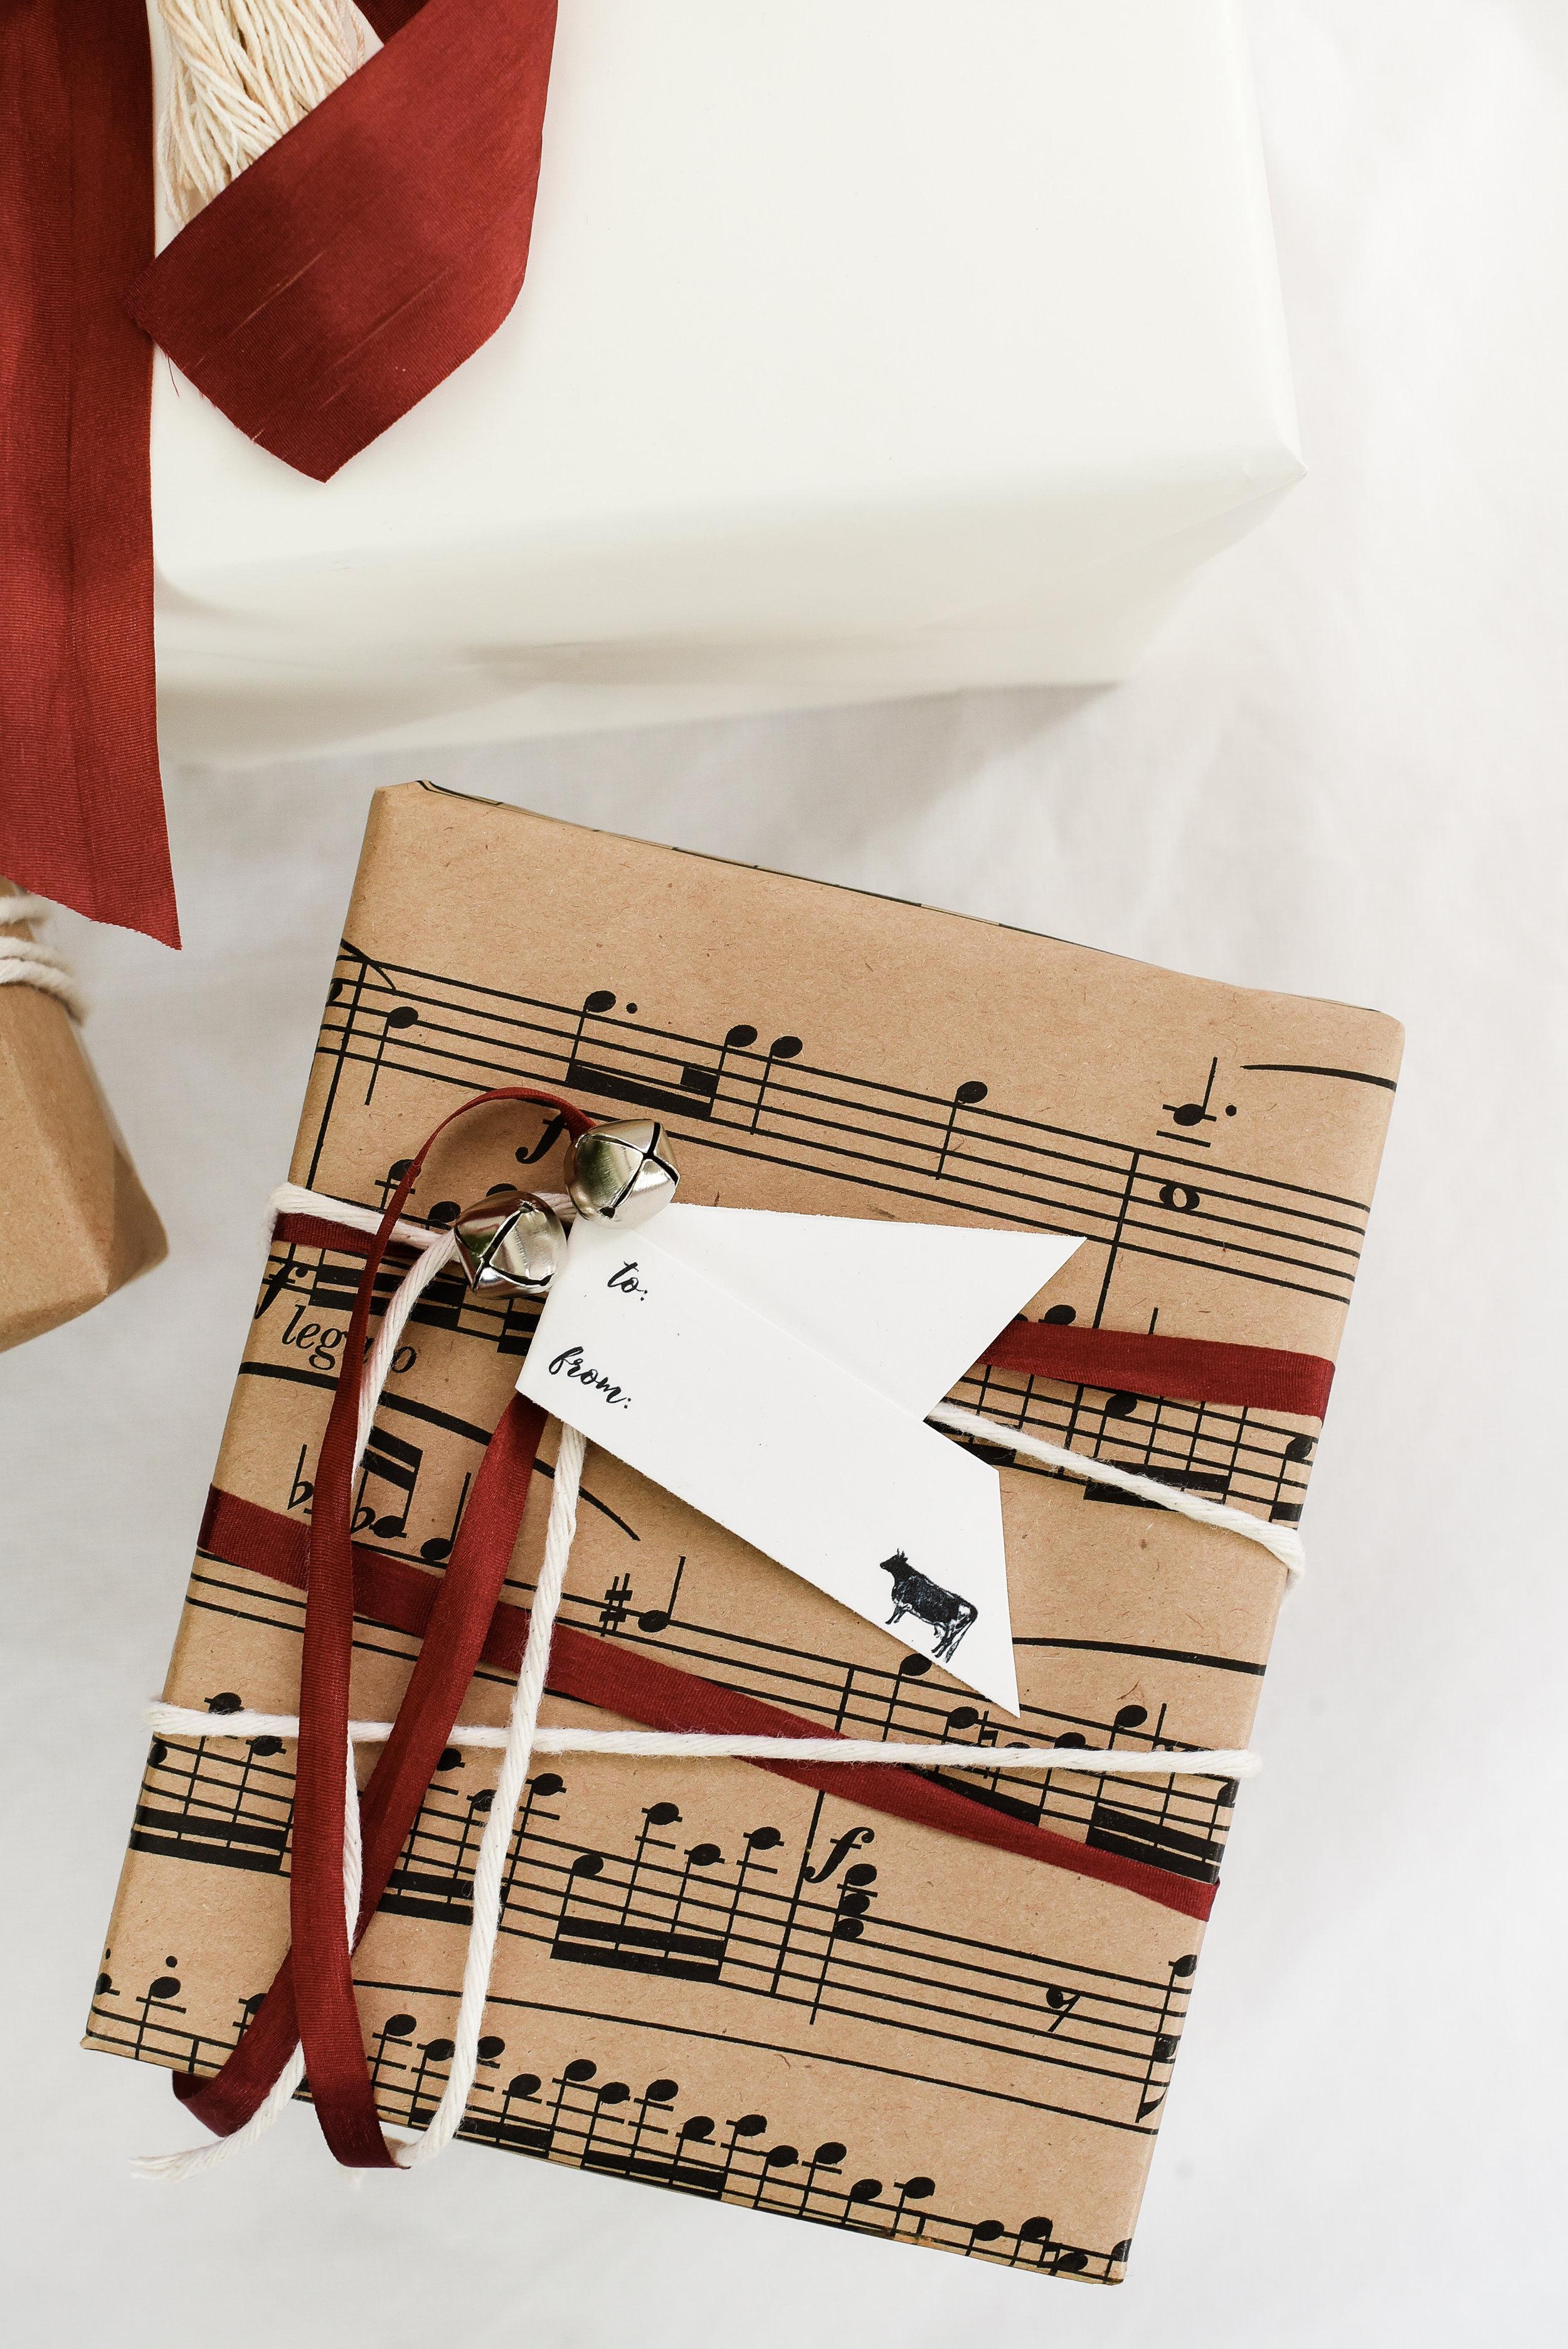 Free printable gift tags for Christmas wrapping | boxwoodavenue.com #christmasgiftwrap #christmaswrappingideas